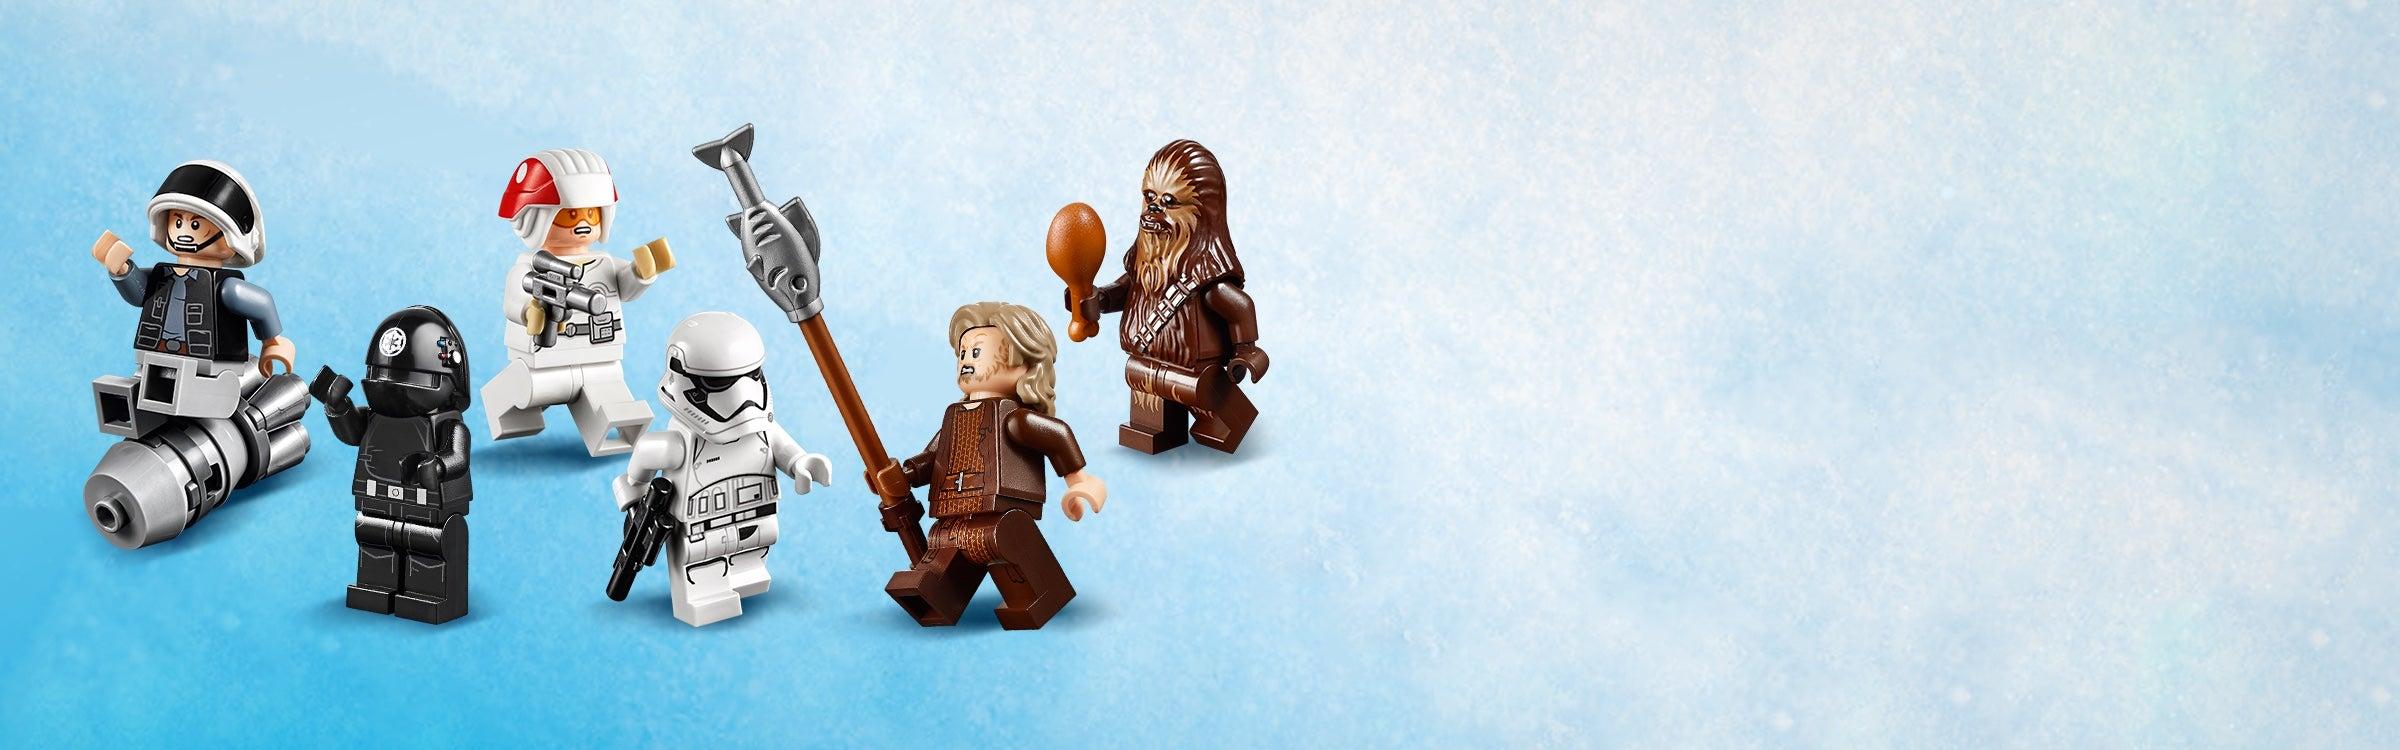 LEGO  75245 Star Wars Advent Calendar LUKE SKYWALKER  NEW.REDUCED